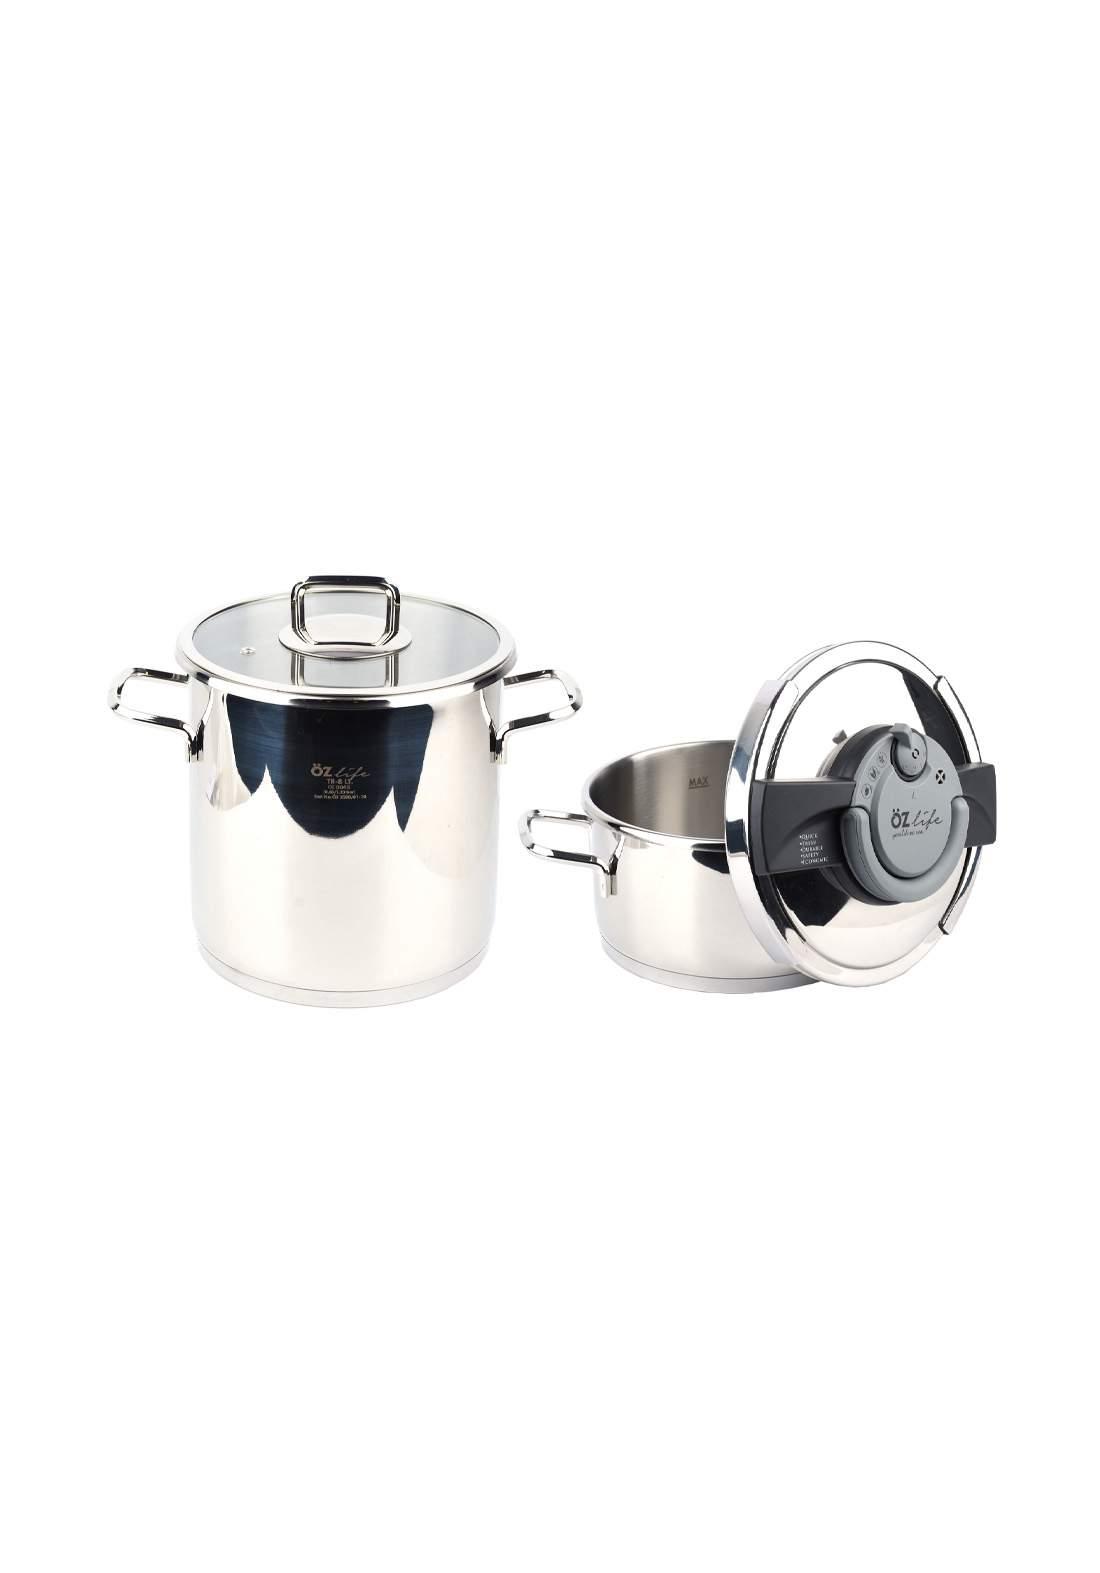 Ozlife Pressure Cooker Set Plain 4 Piece  قدور ضغط + قدور